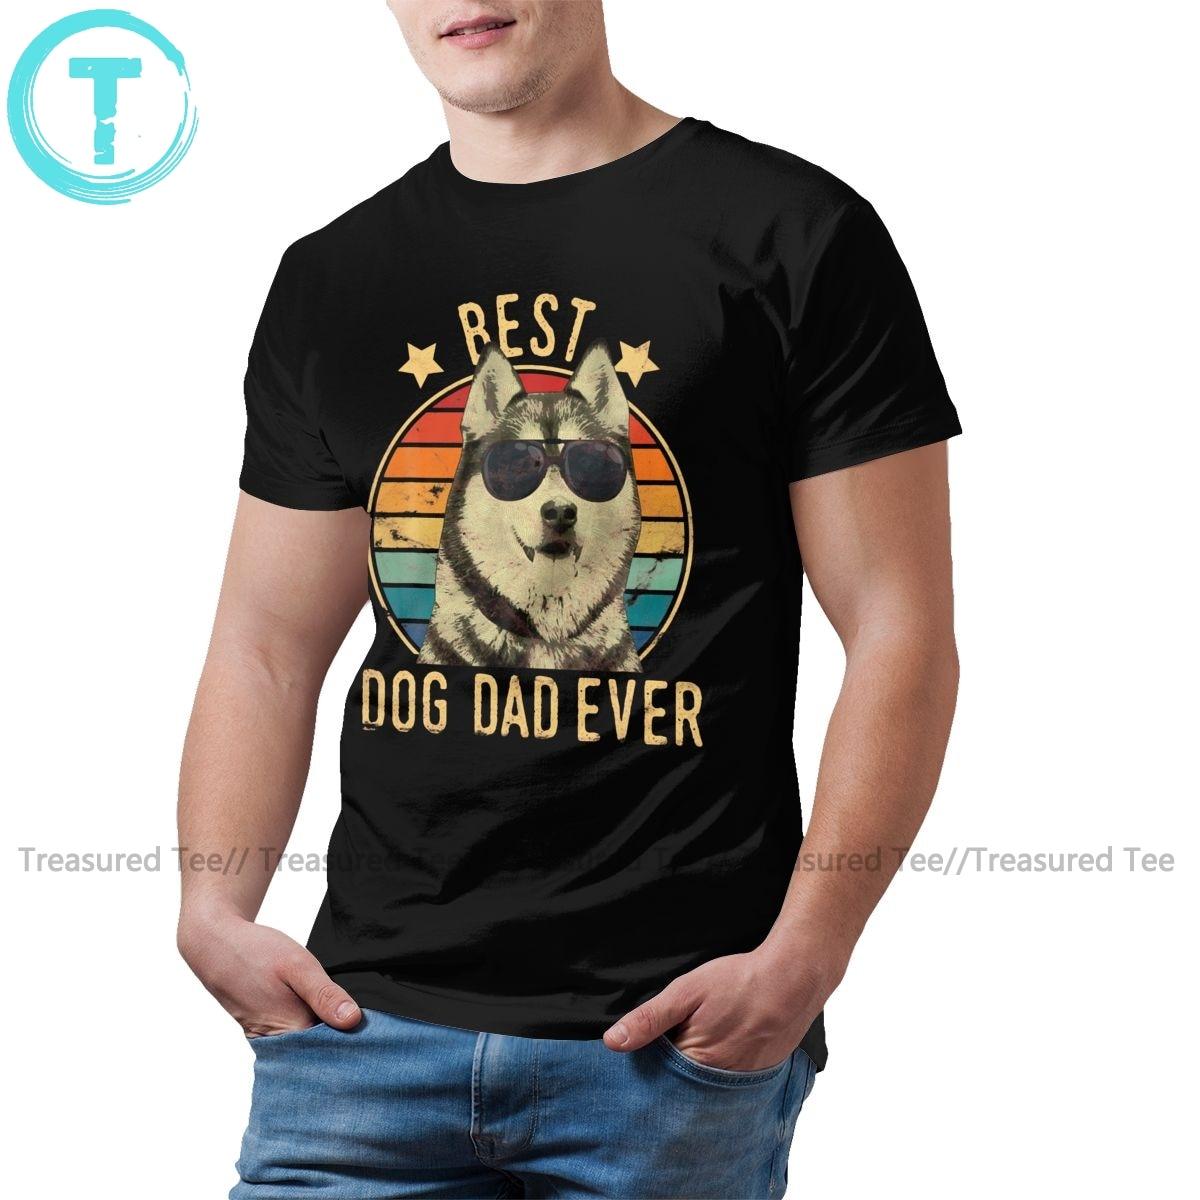 Camiseta siberiana Husky para hombre, mejor perro, papá, nunca siberiano, camiseta Streetwear para hombre, Camiseta con estampado divertido, camiseta 5x